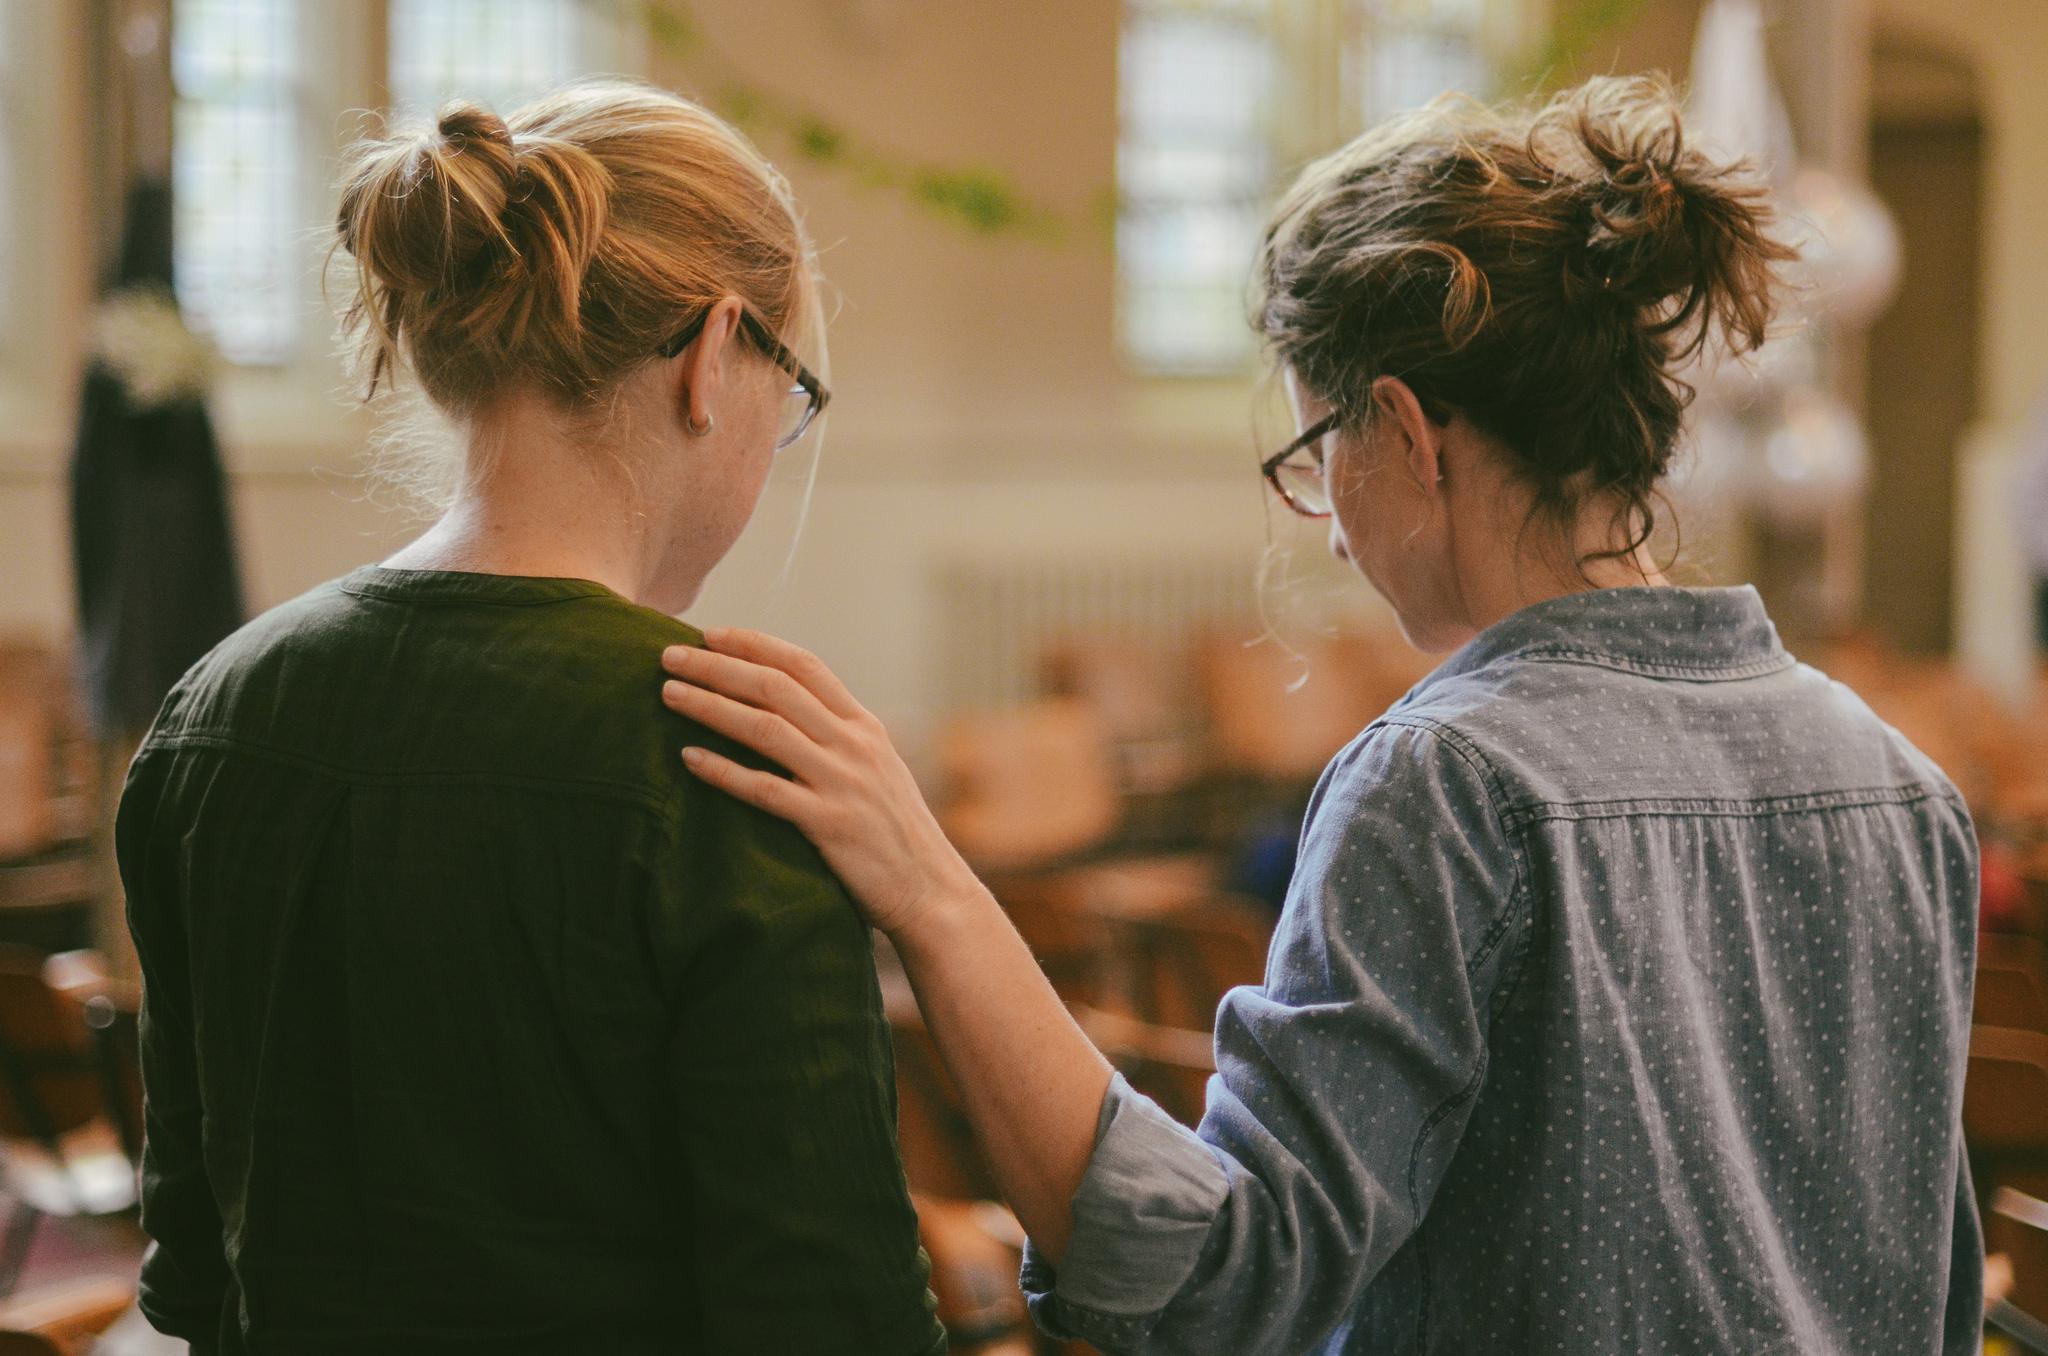 Nieuwe ministry-cursus start op 6 september, doe jij mee?